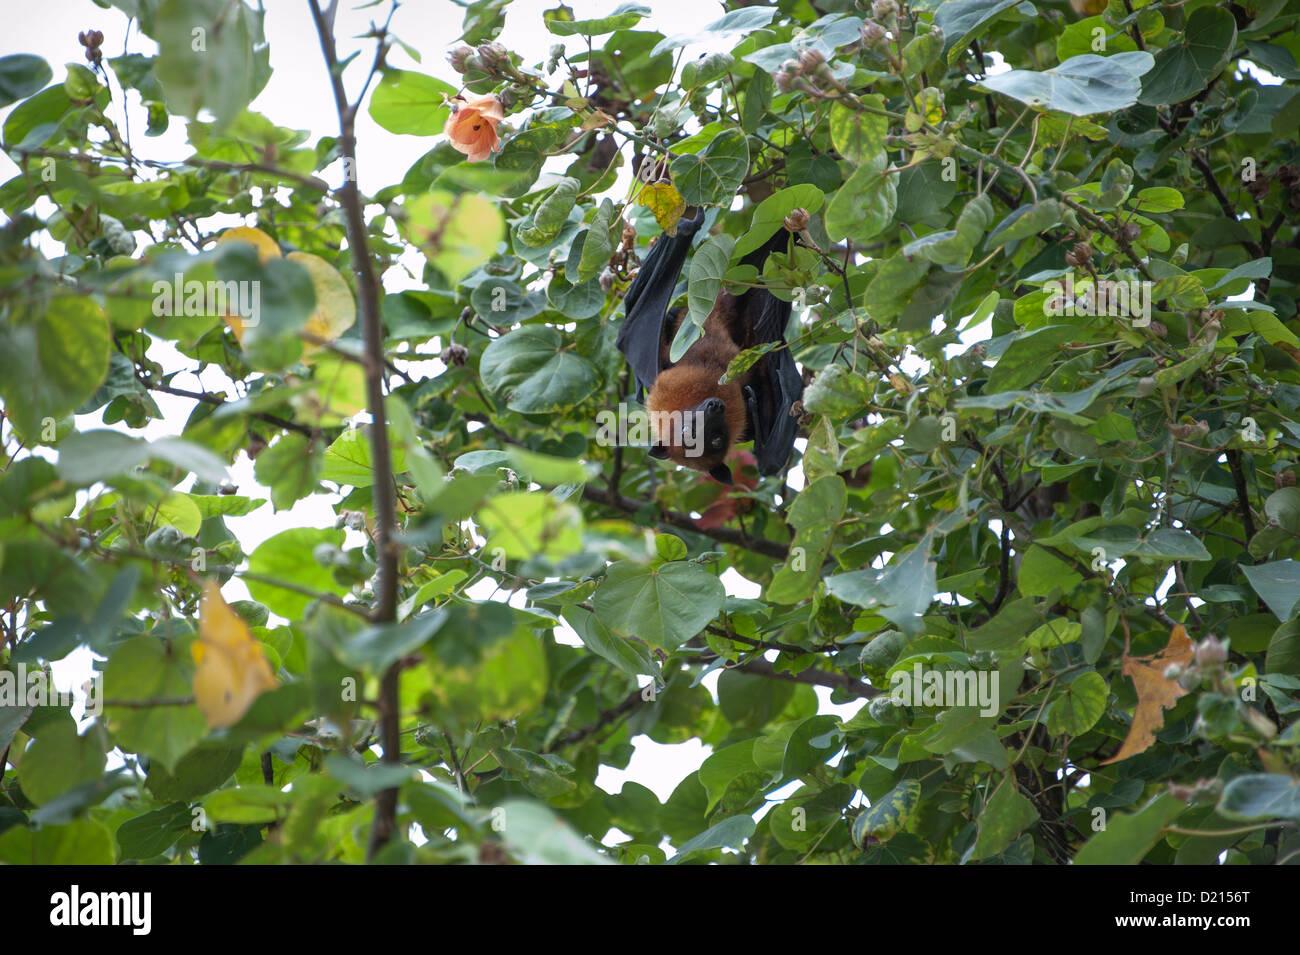 Fruit bat in tree Stock Photo